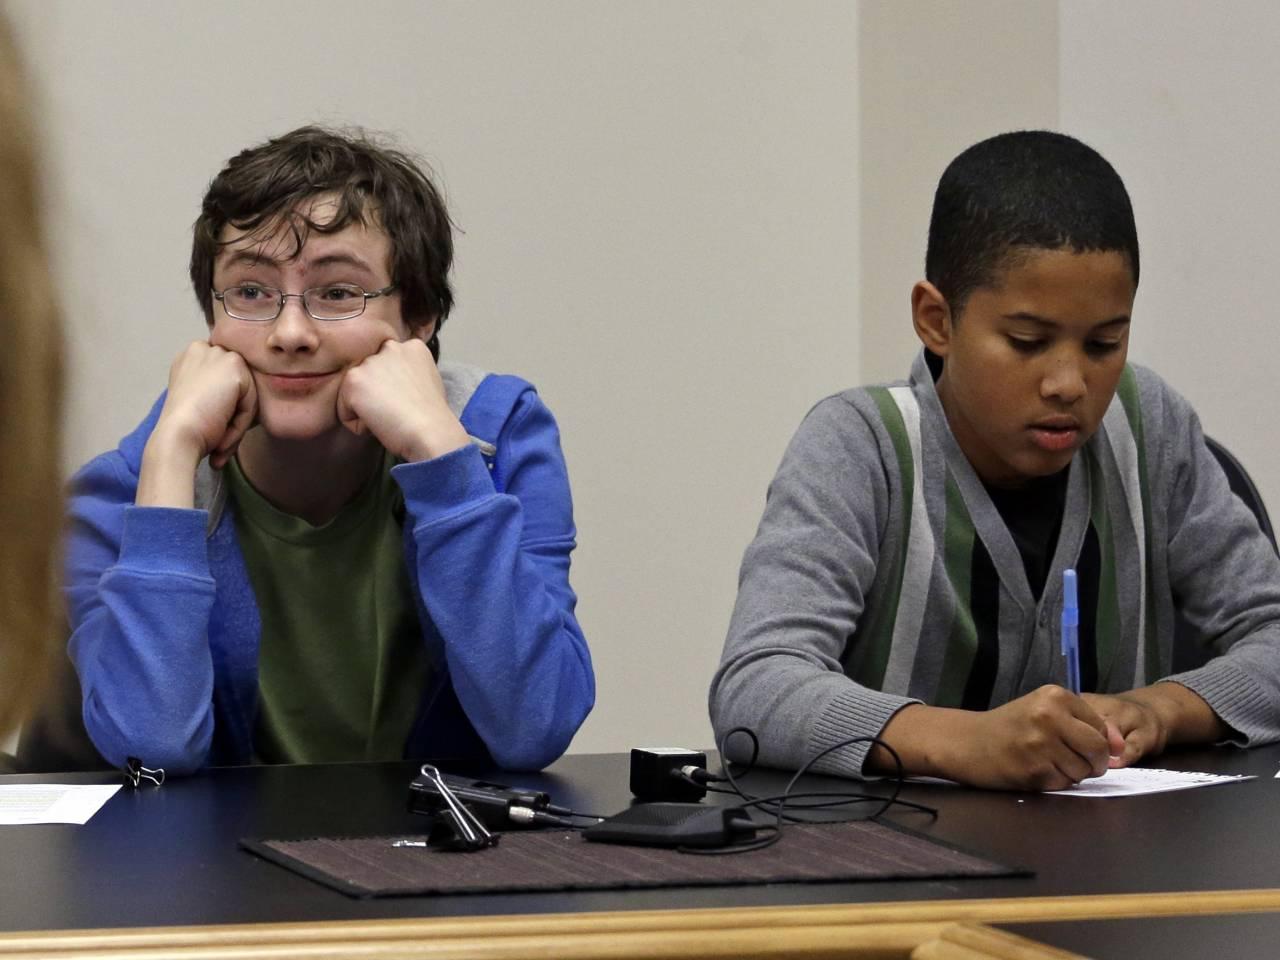 Washington state government for kids - Washington State Government For Kids 5